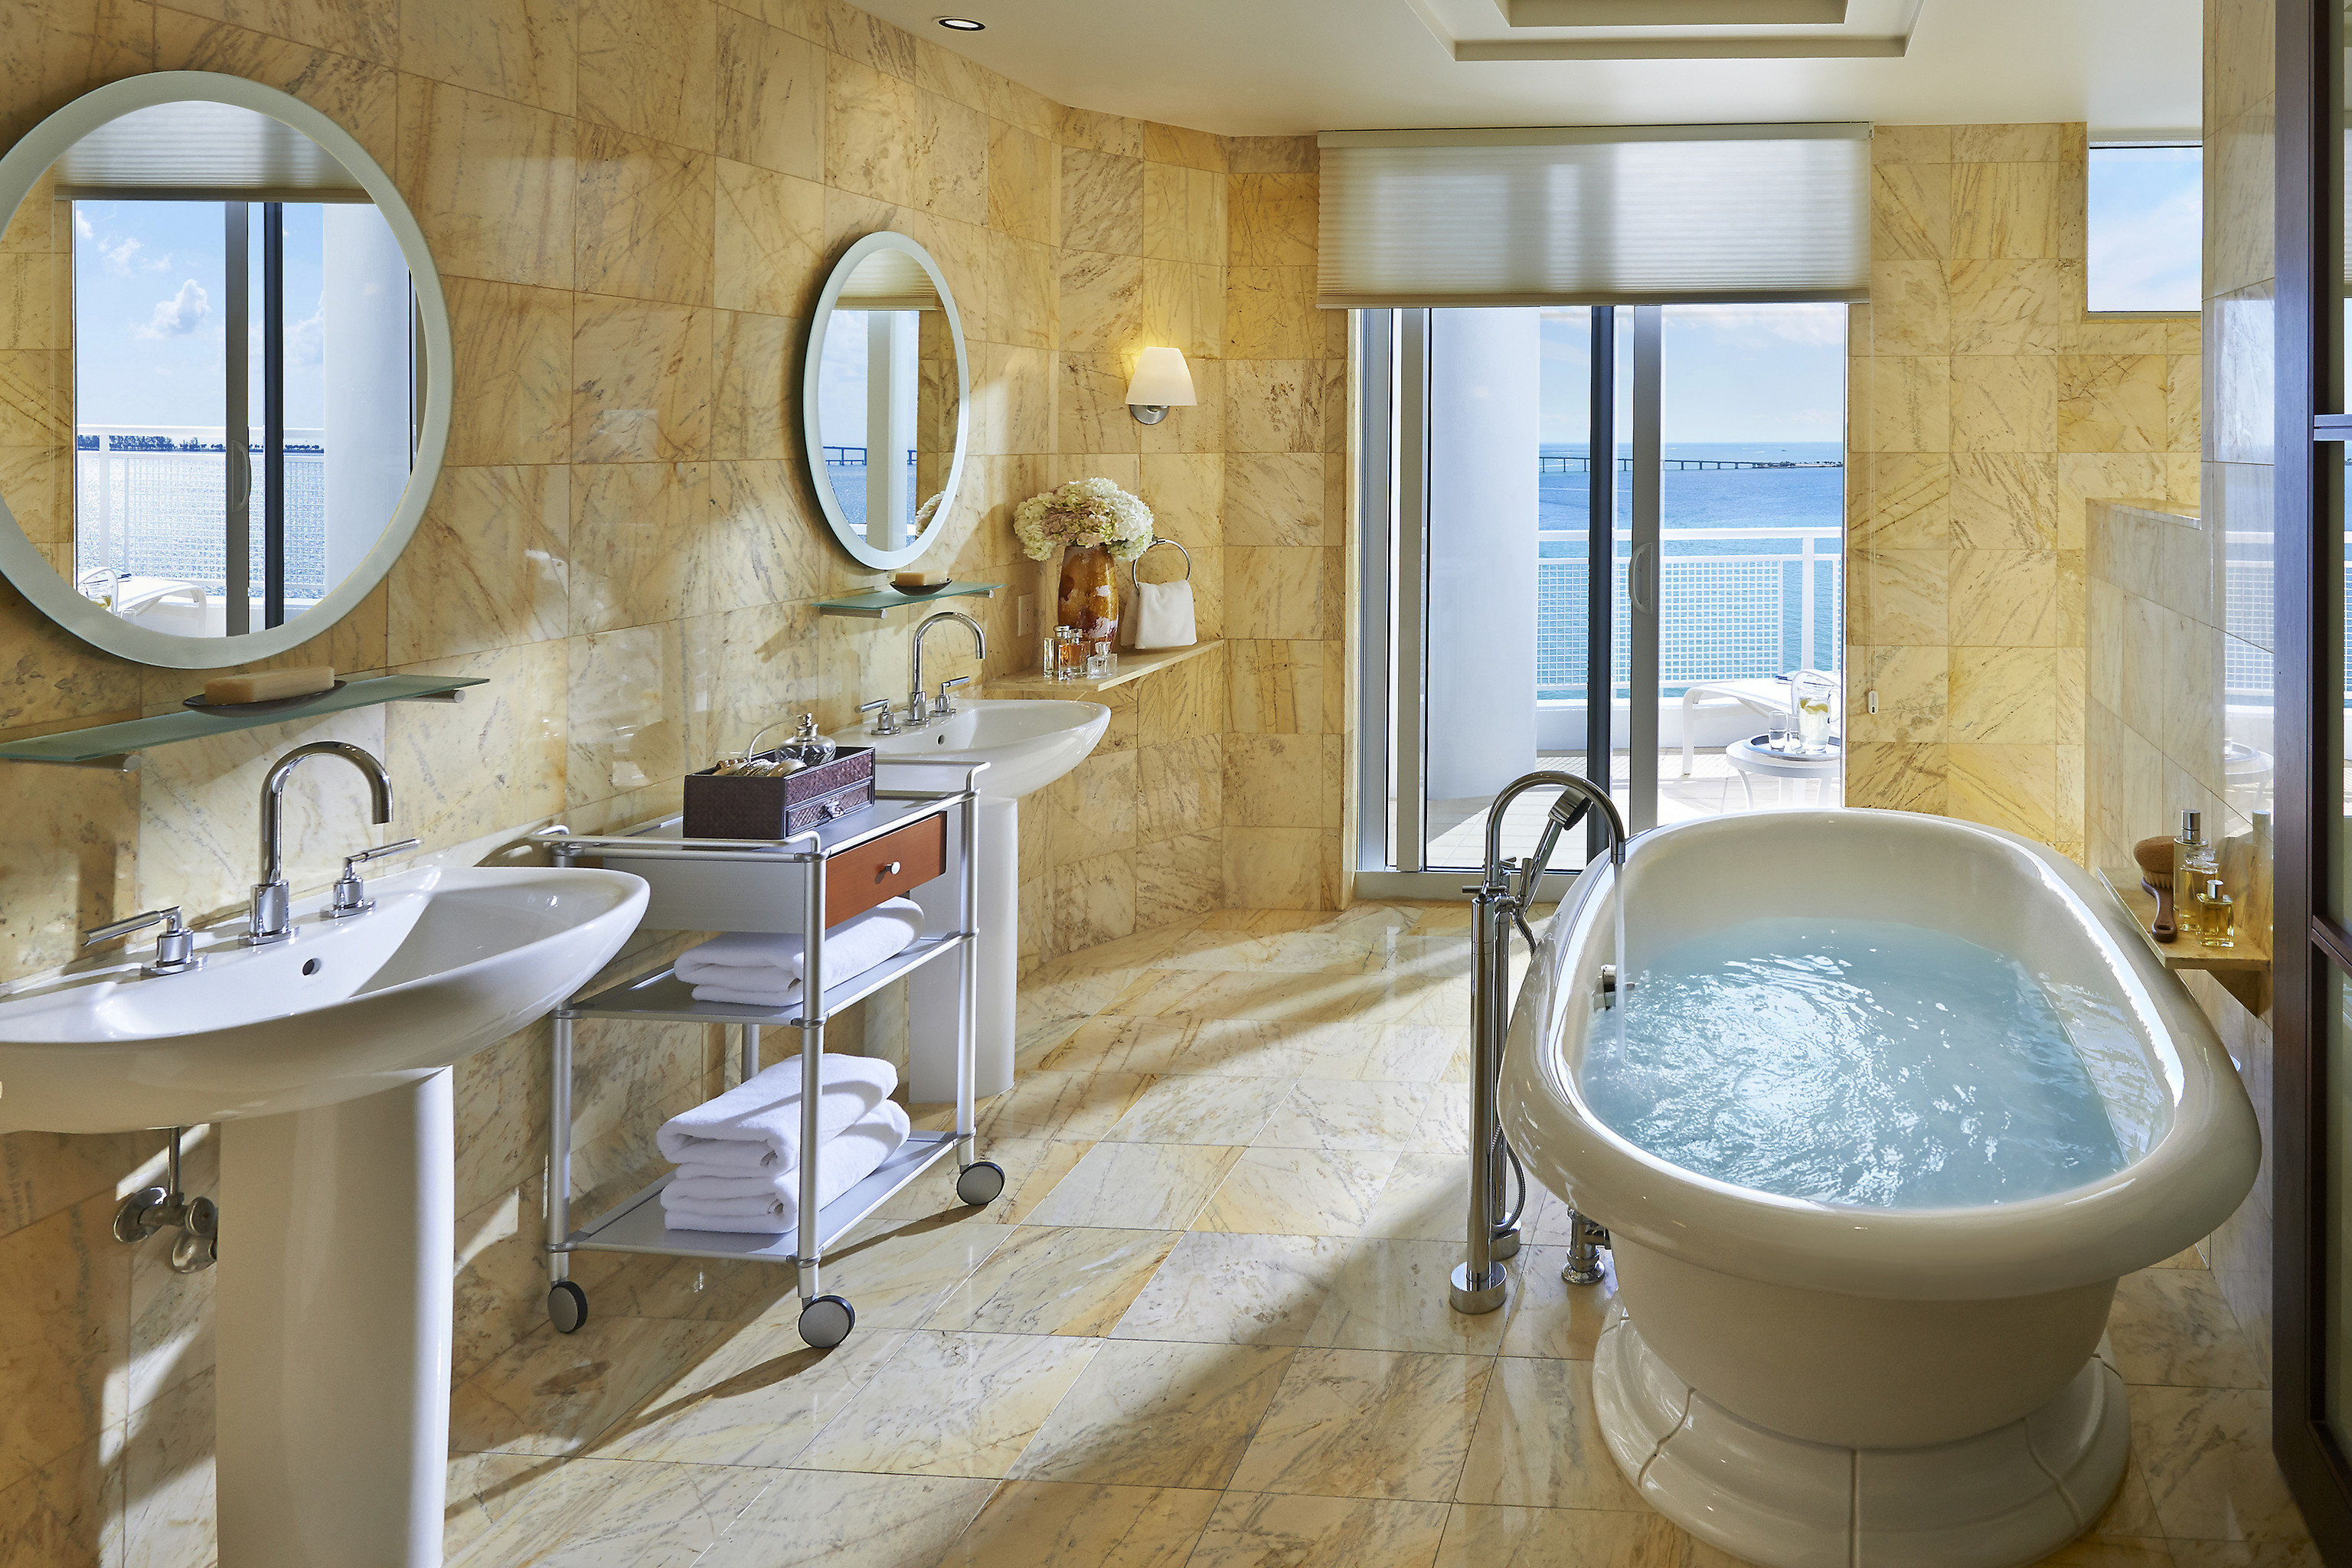 bathroom property sink home tub plumbing fixture tile bathtub flooring Bath tiled